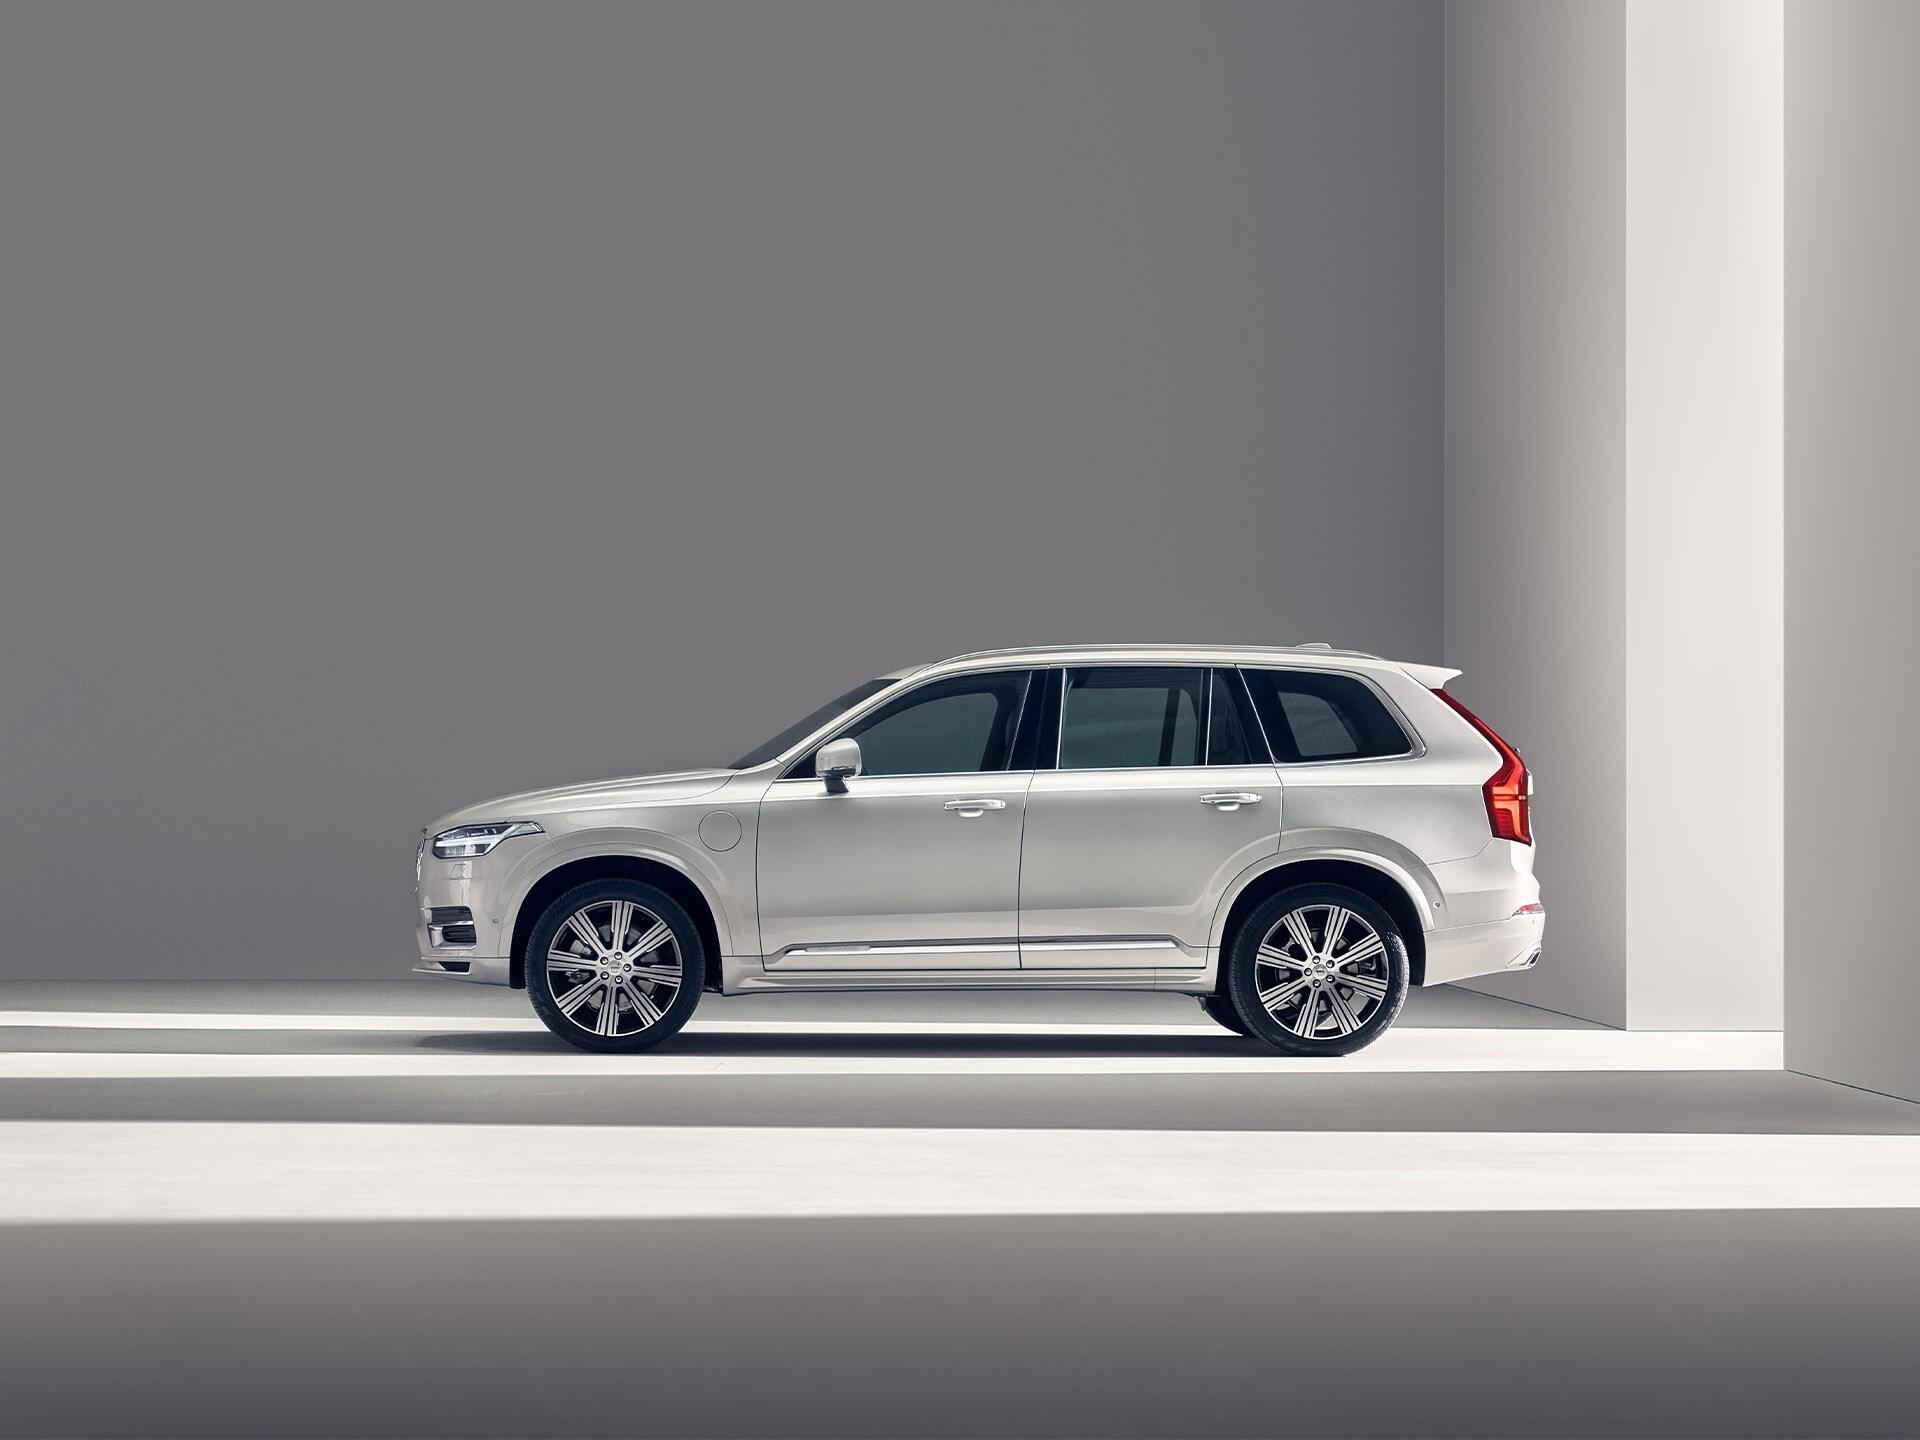 Um SUV Volvo XC90 Recharge branco, parado